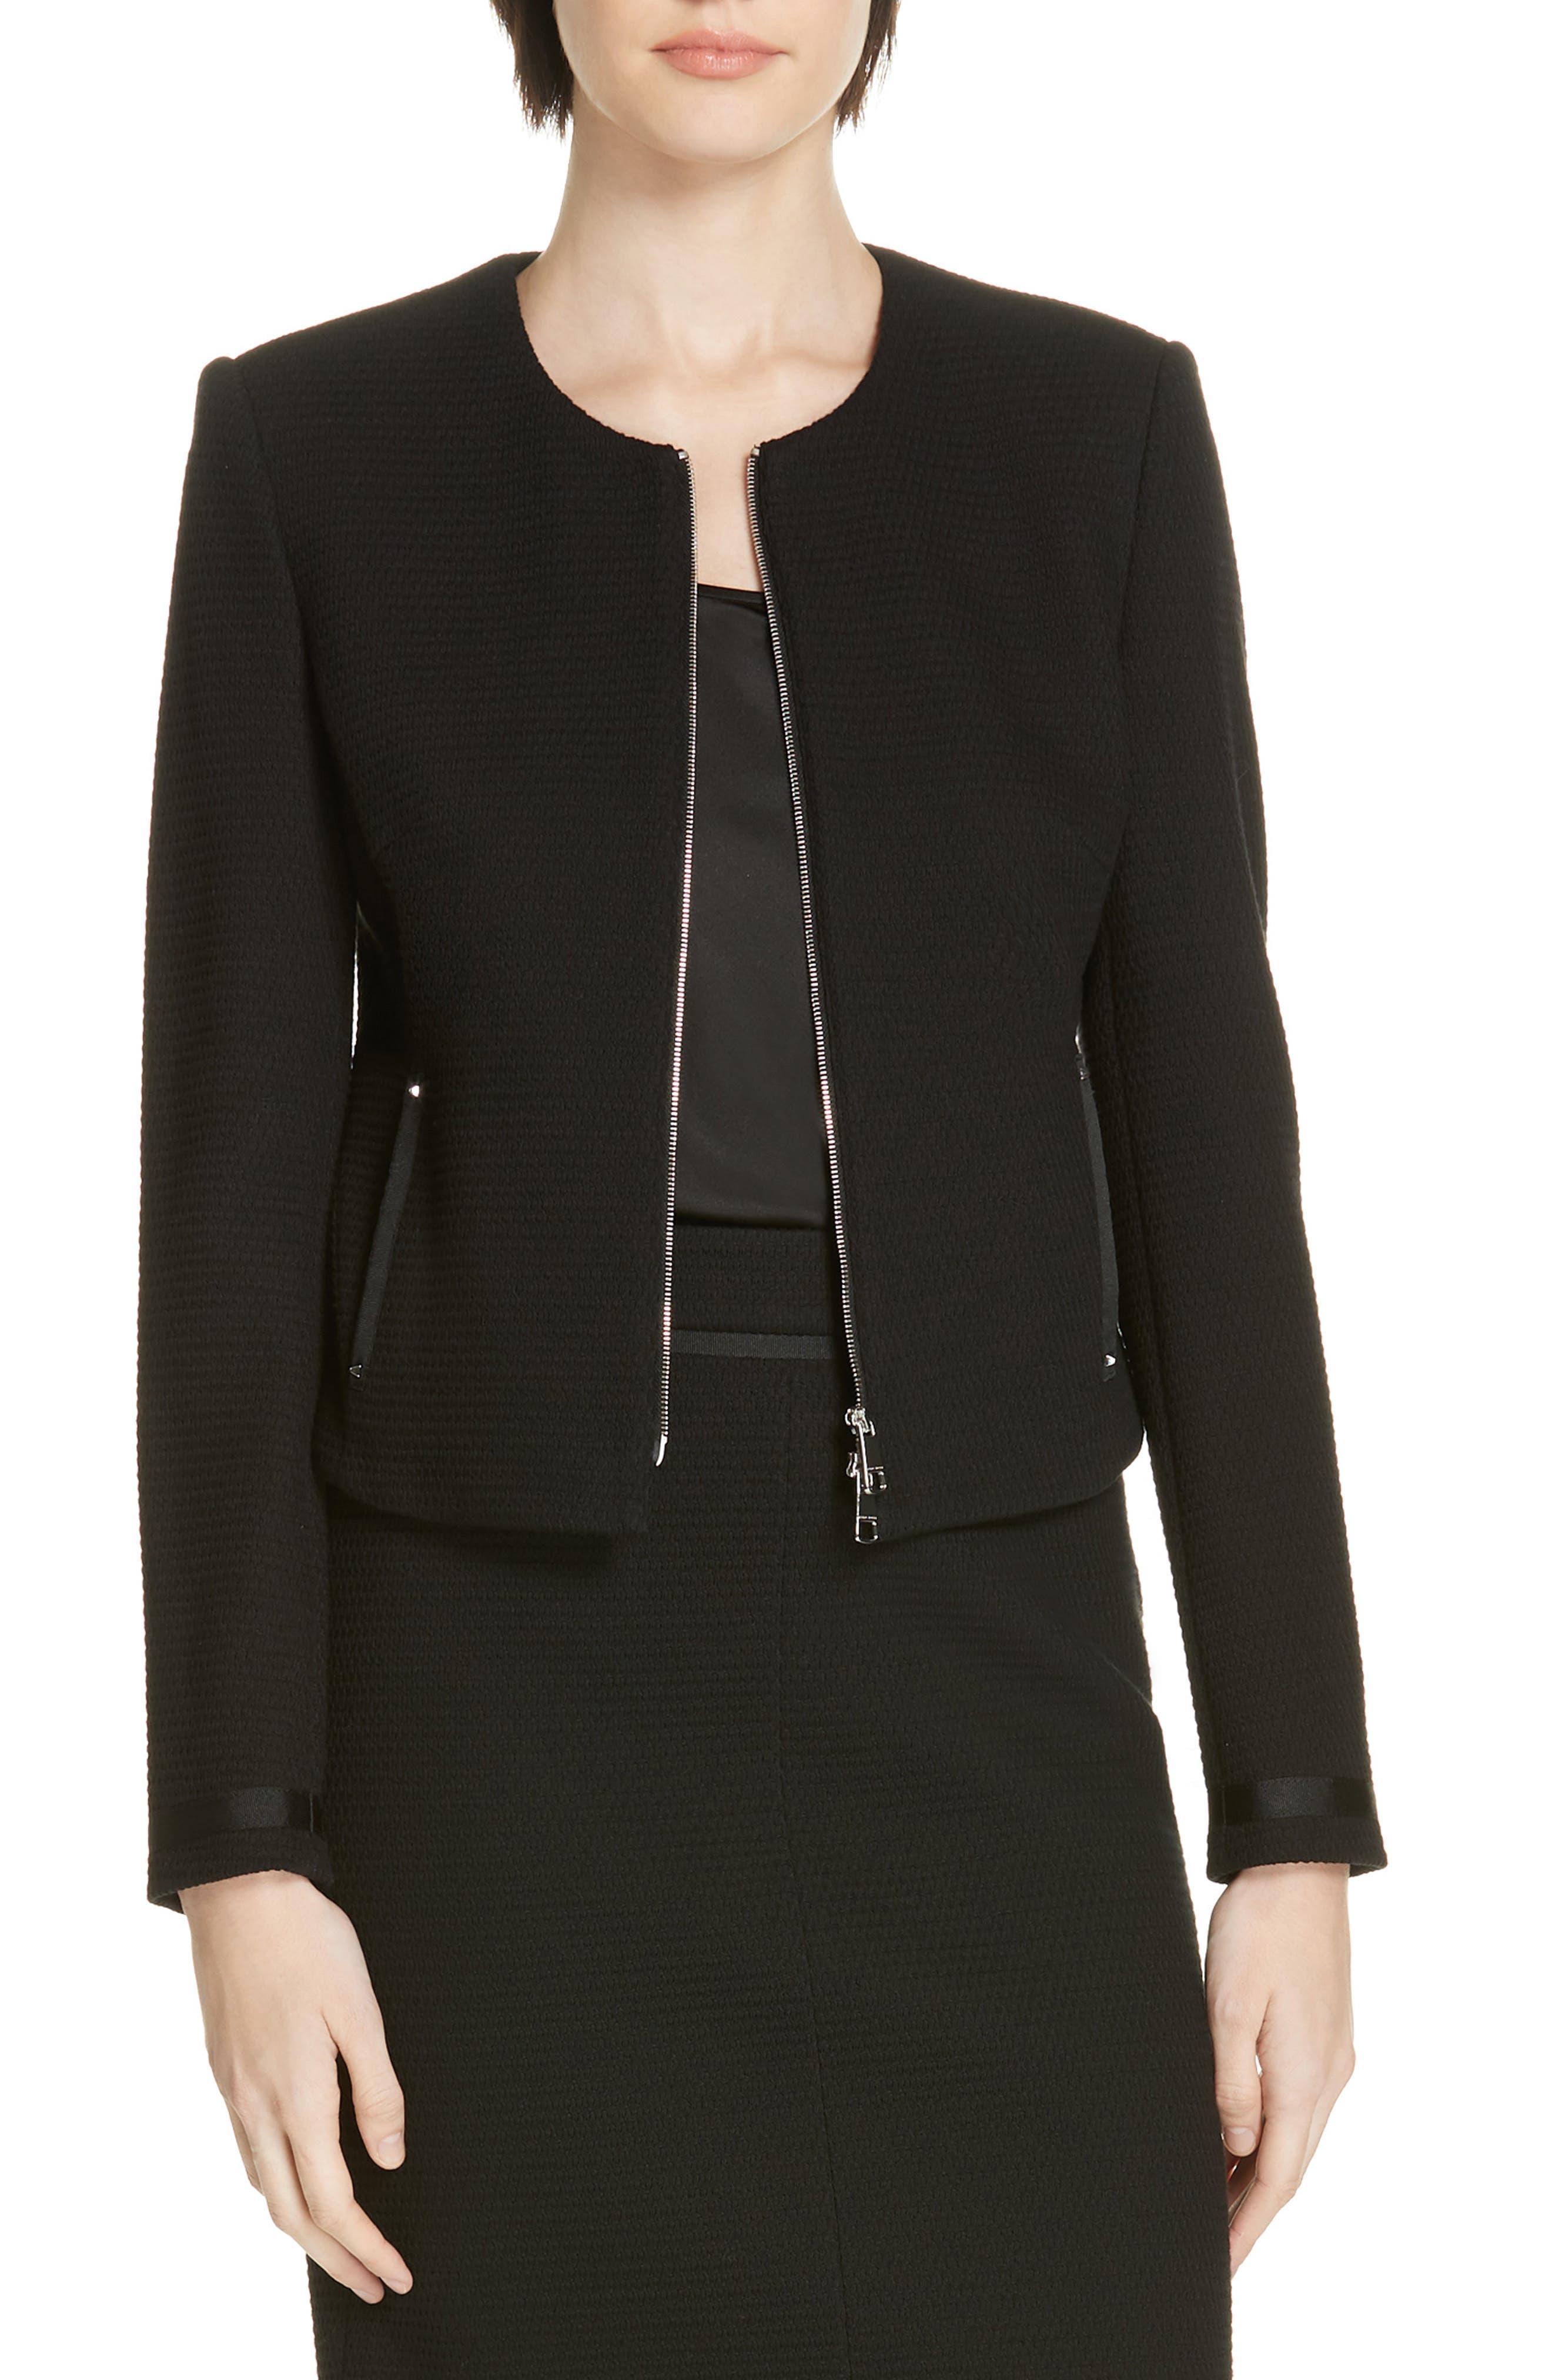 Kemio Textured Jersey Suit Jacket,                             Main thumbnail 1, color,                             BLACK